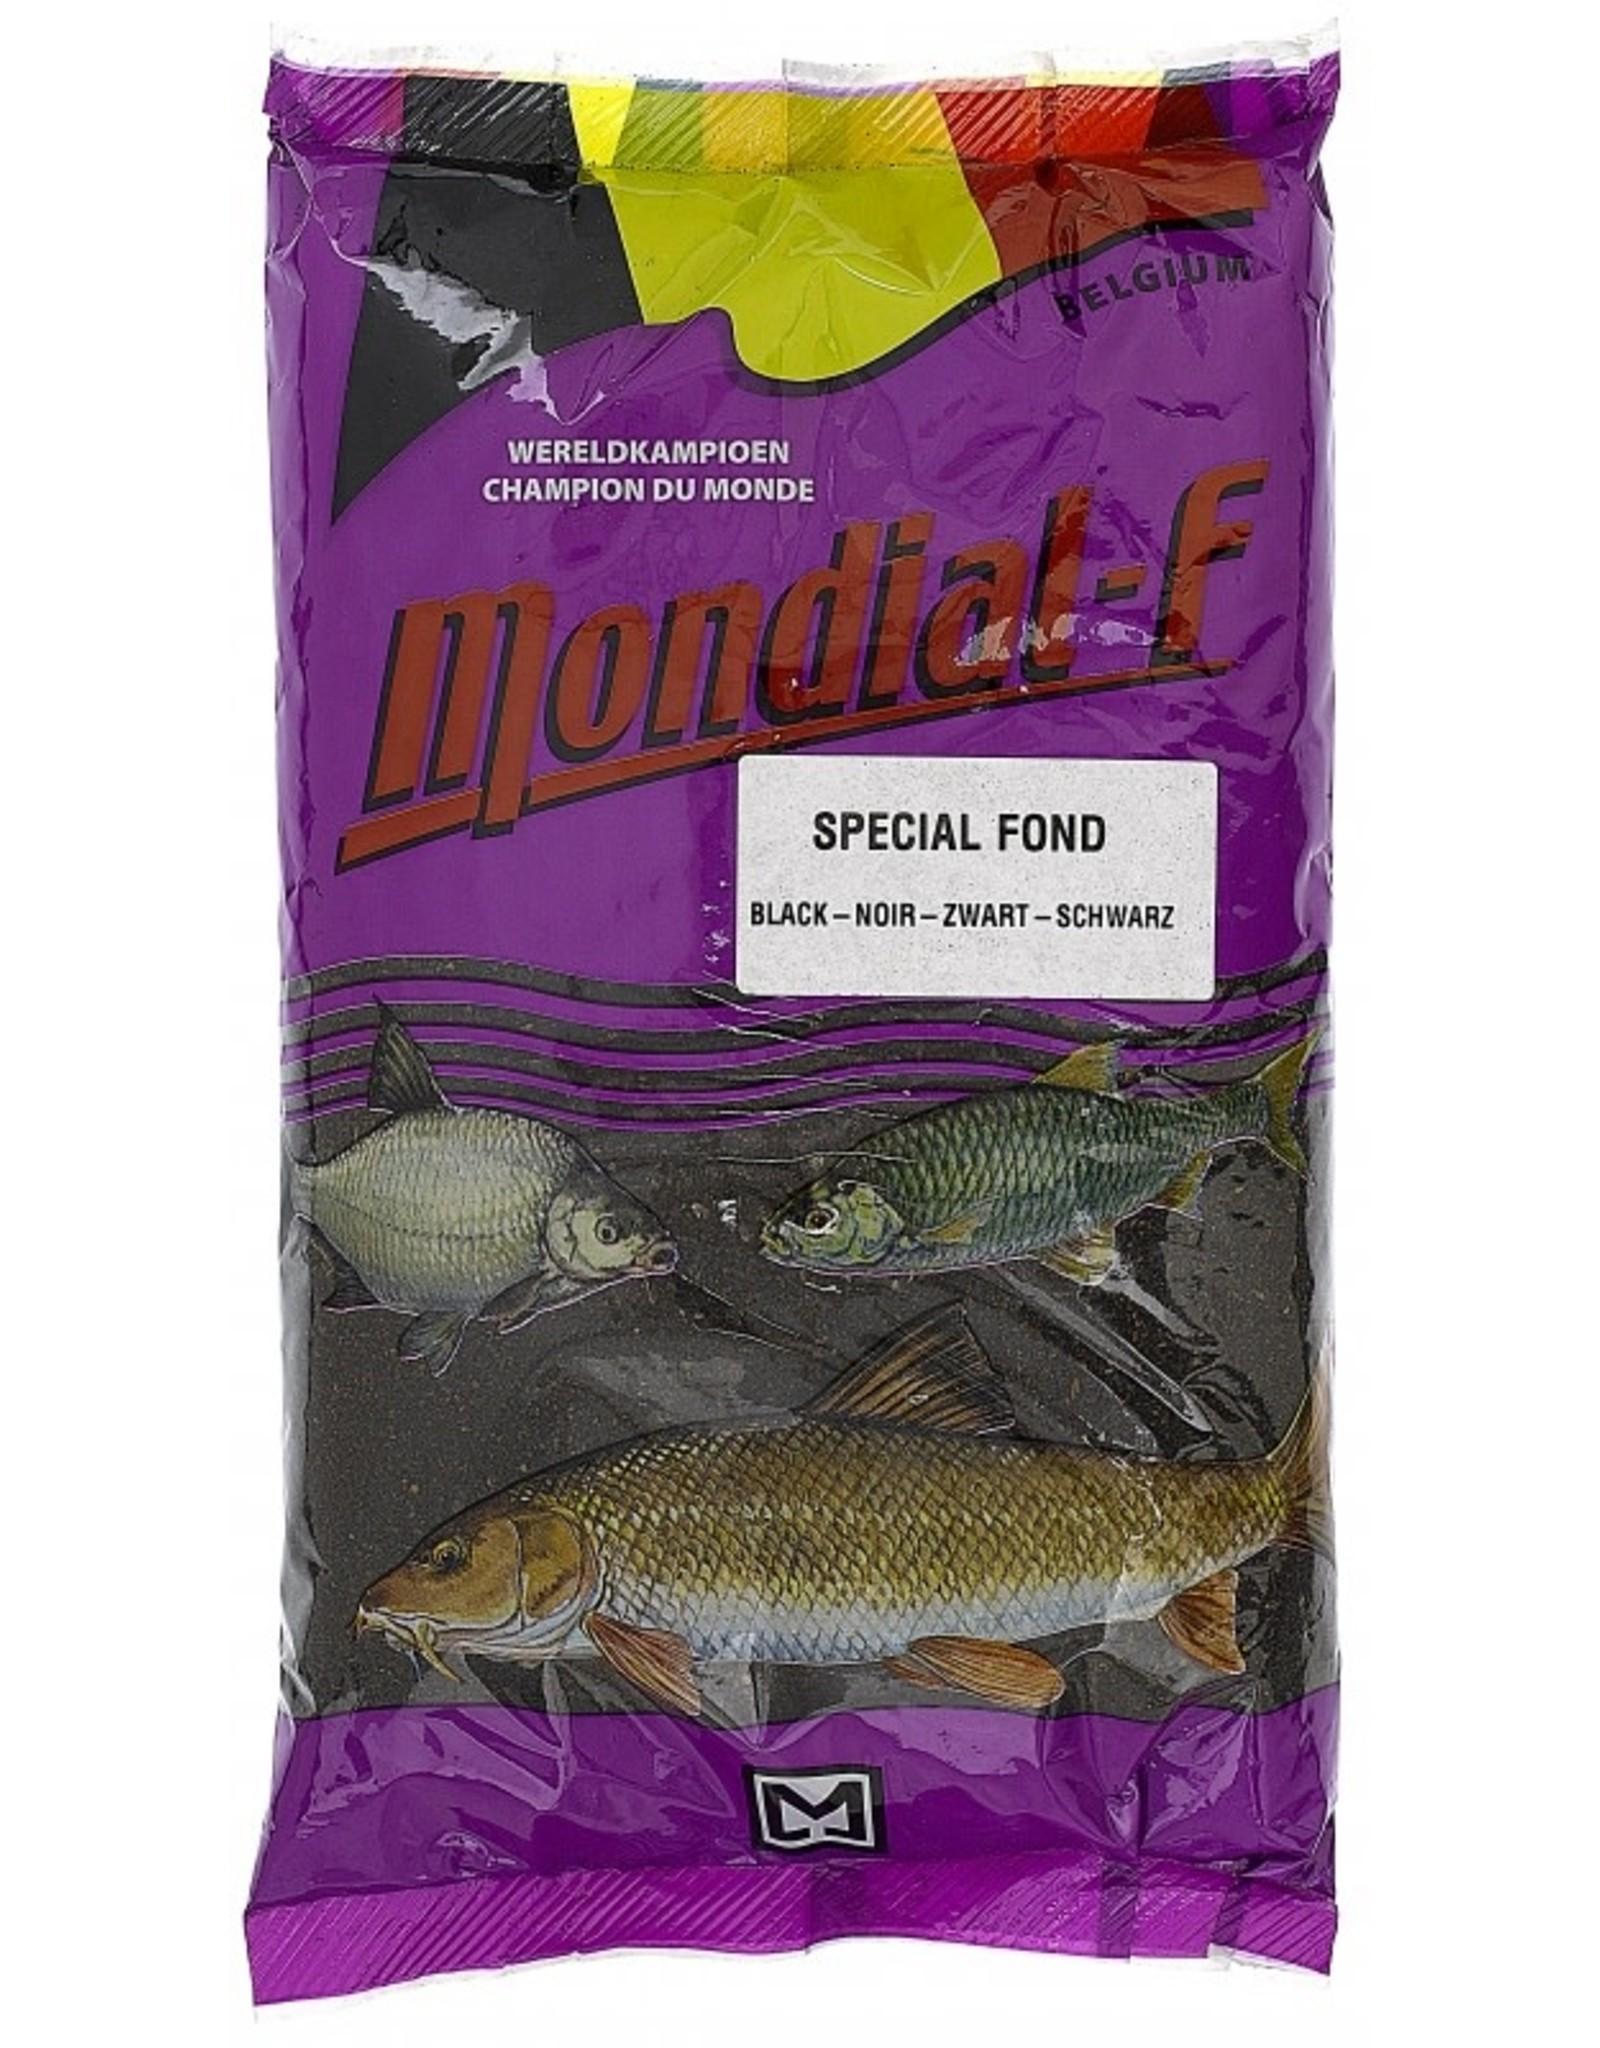 MONDIAL-F SPECIAAL FOND ZWART 1KG